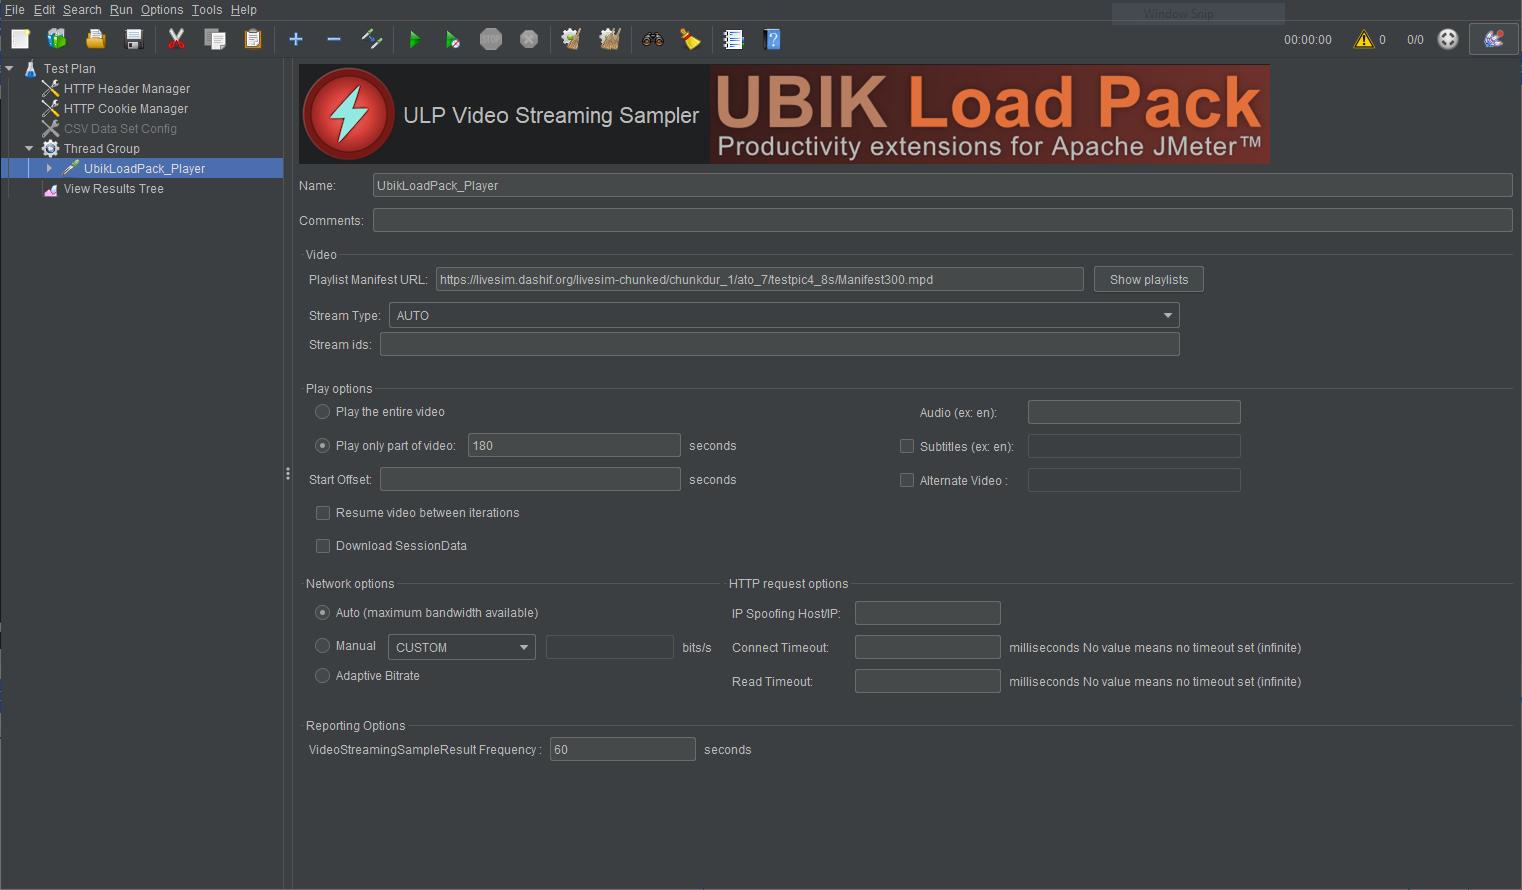 UbikLoadPack streamin Plugin  Low Latency Dash